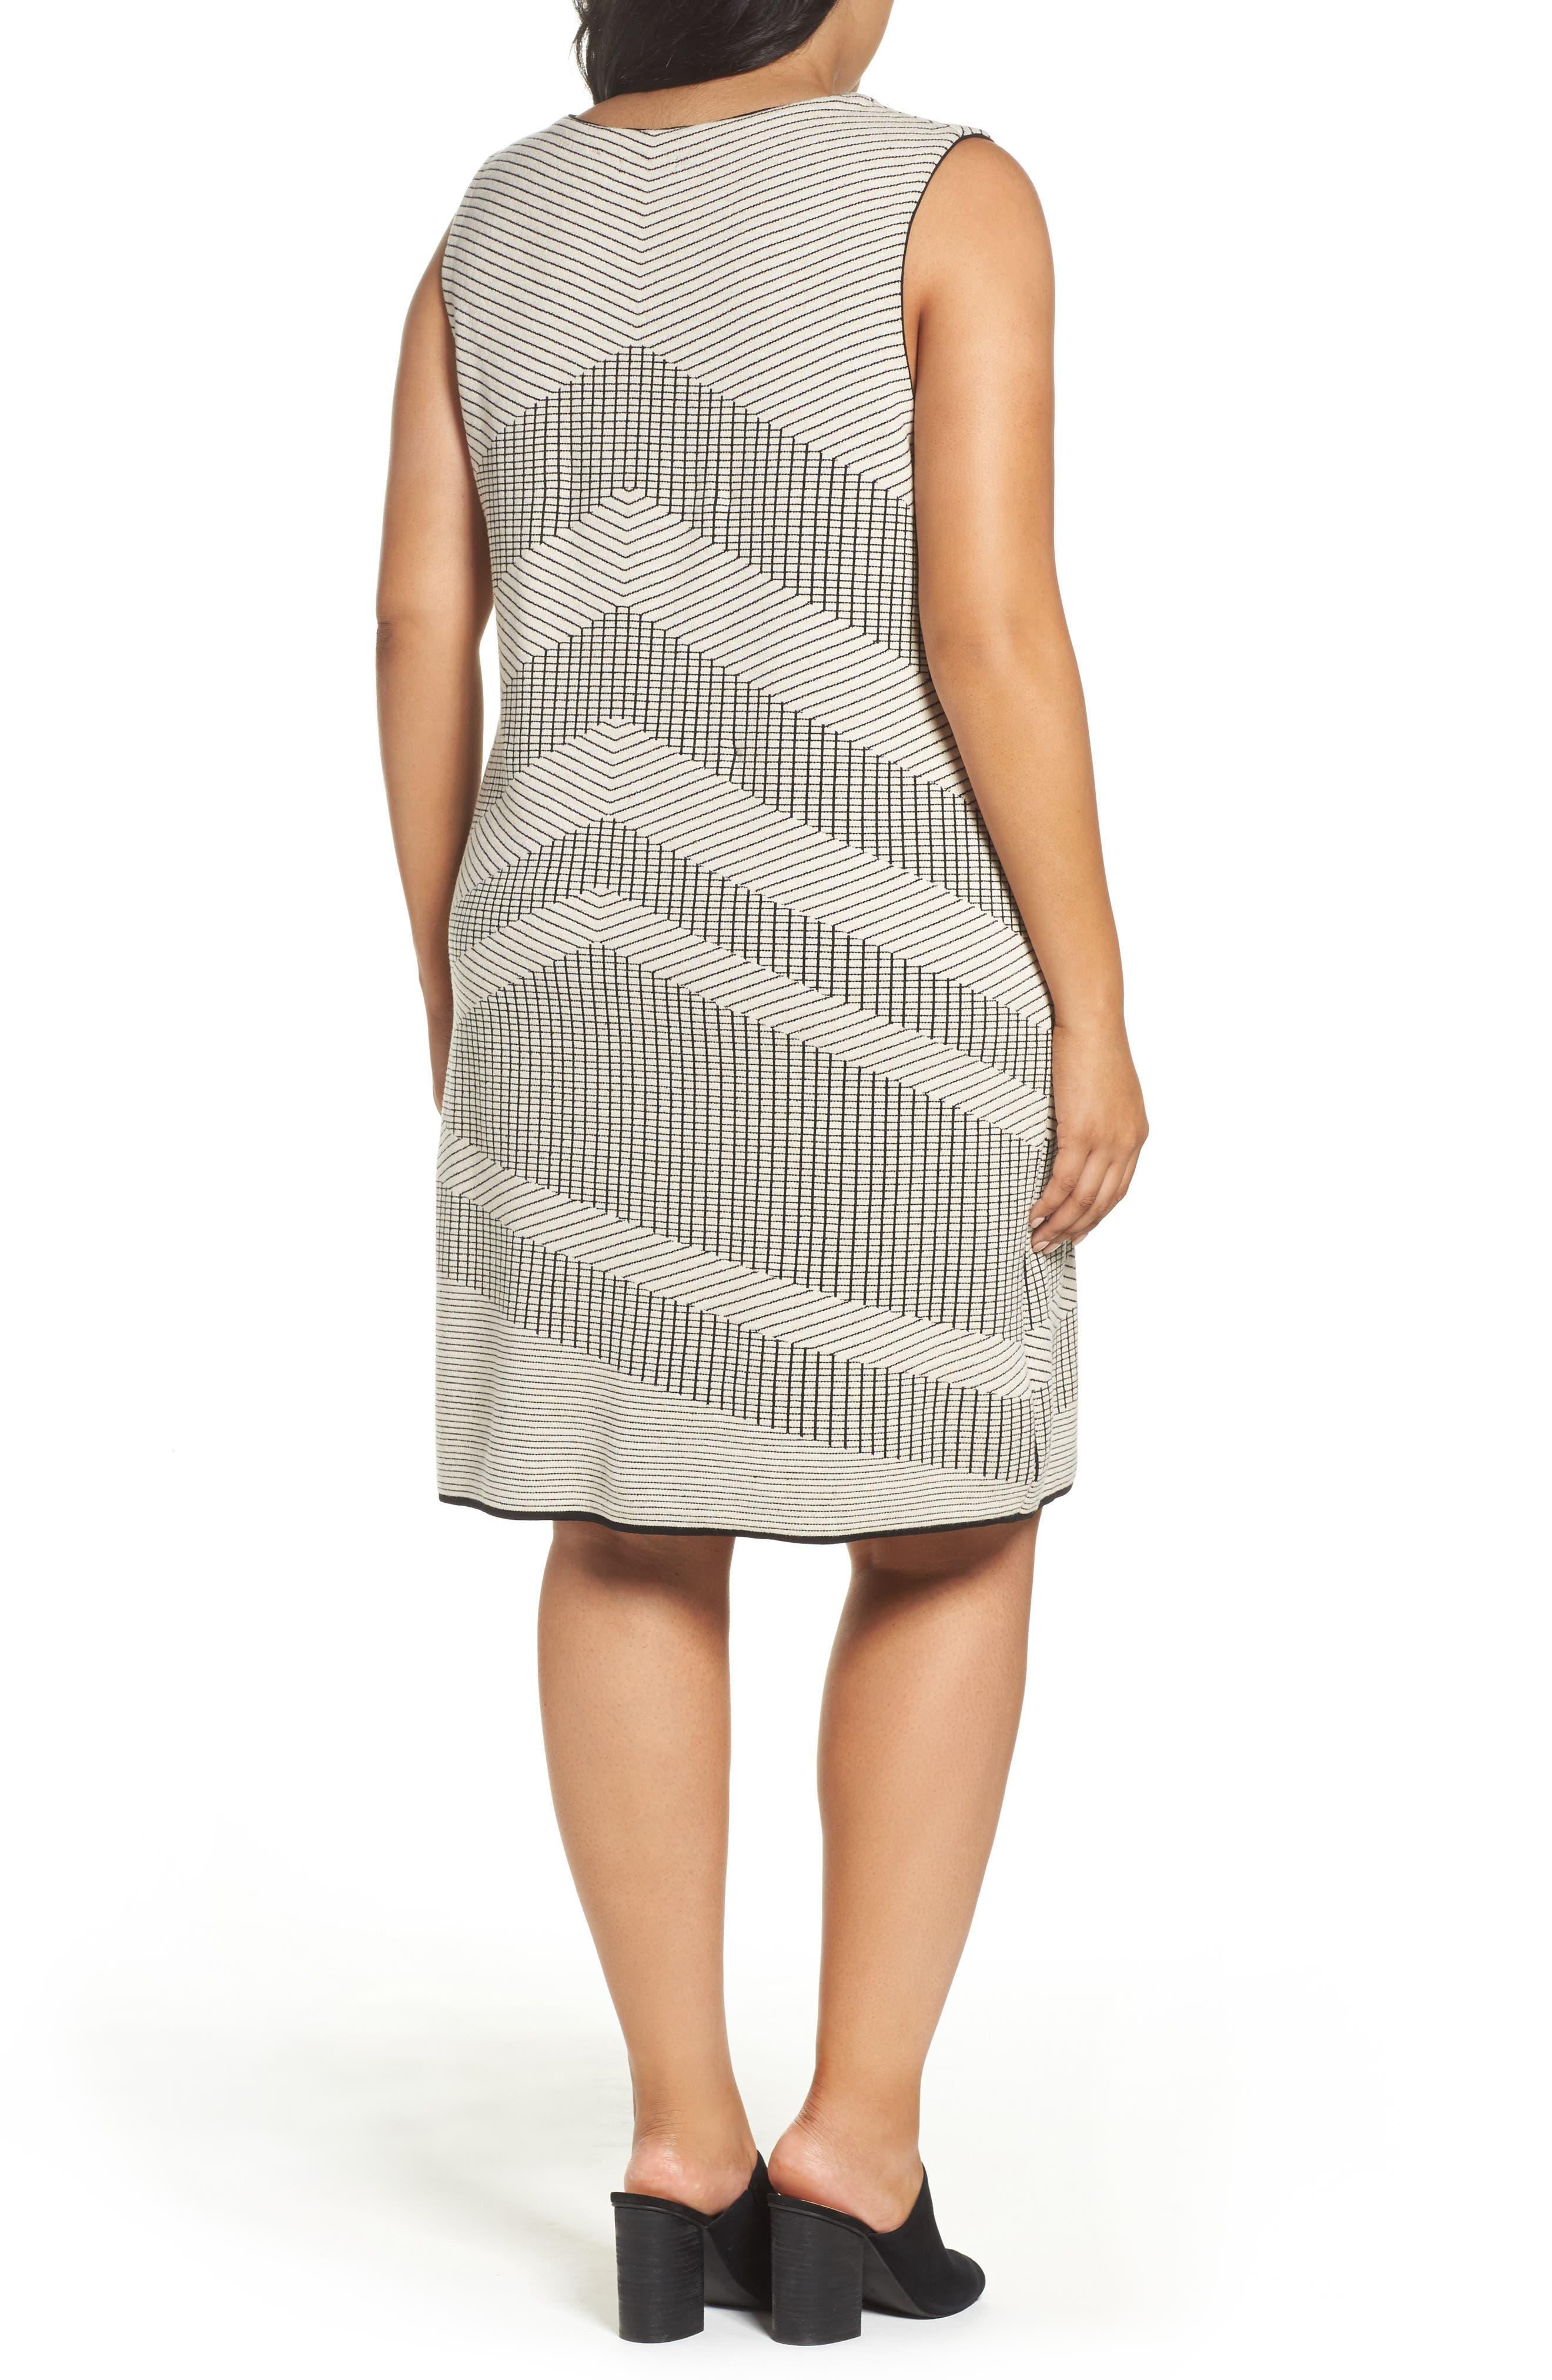 Mantra Chevron Stripe Knit Sheath Dress,                             Alternate thumbnail 2, color,                             Creme Brulee